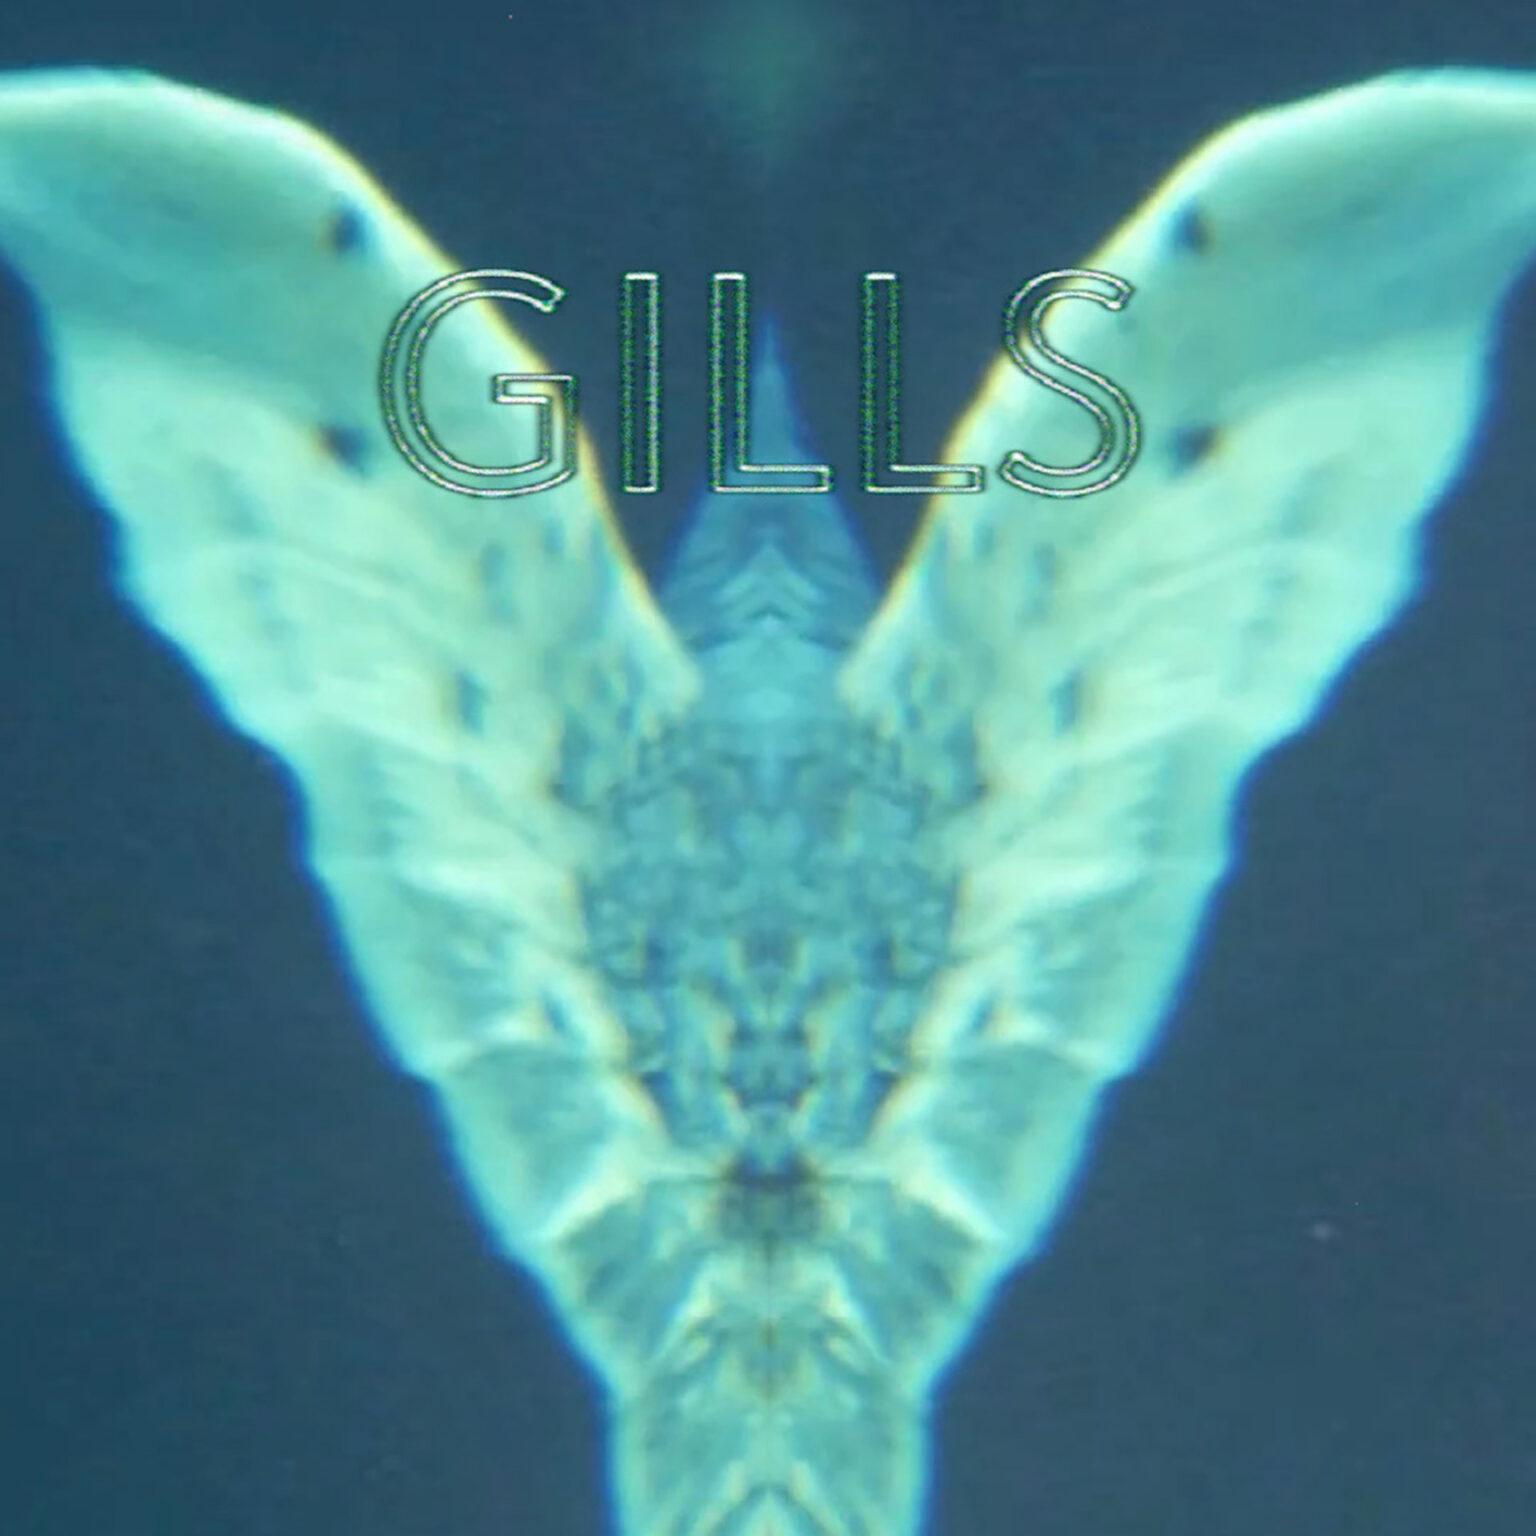 Elda - Single - GILLS - 2021 - s'läuft! Radio-Promotion